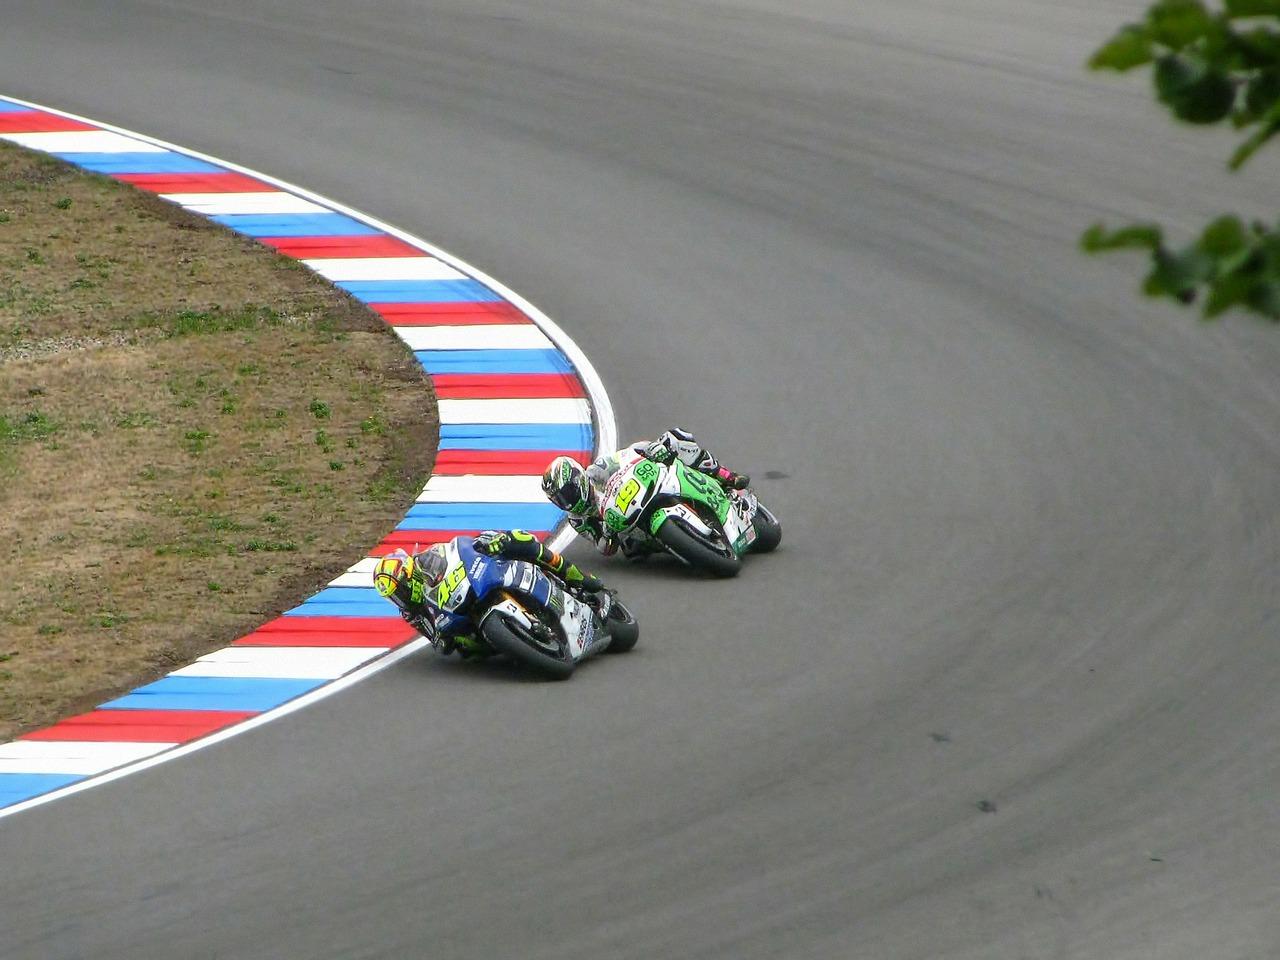 Valentino Rossi and Alvaro Bautista